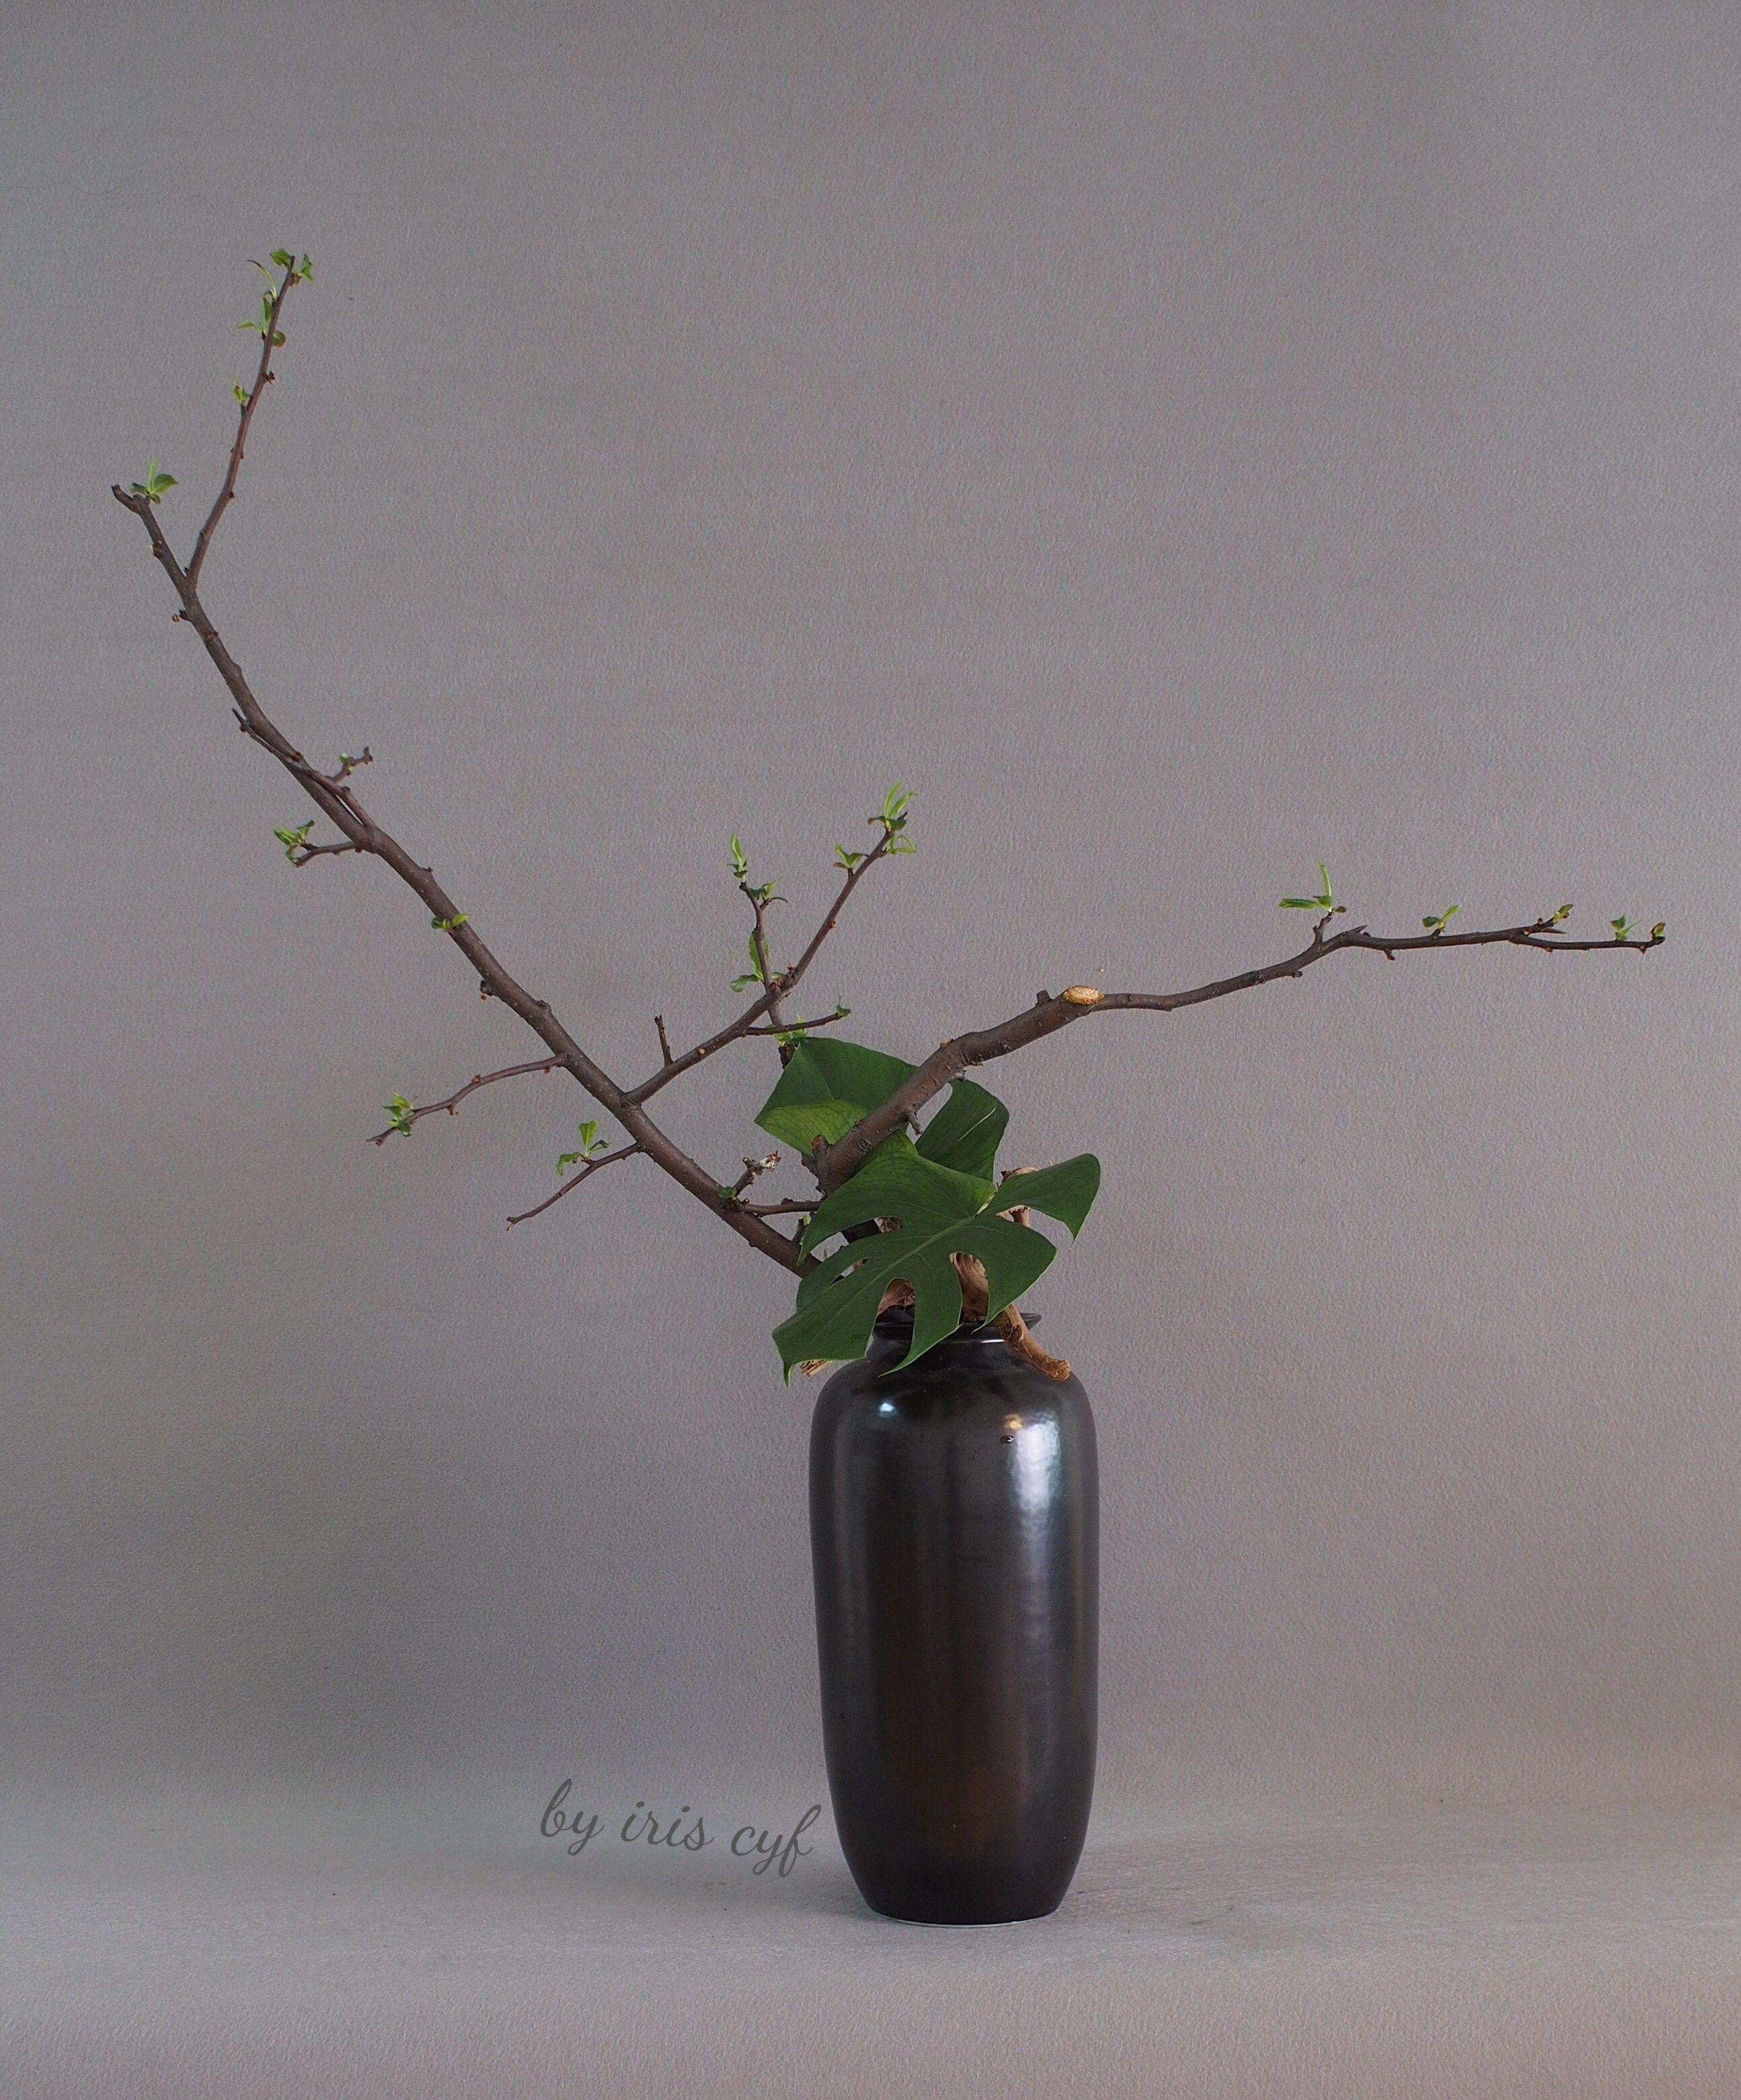 Japanese Ikebana Vases Of Vasei¼Œgreen Ikebana Leaf Ikebana by Iriscyf Pinterest Ikebana with Vasei¼Œgreen Ikebana Leaf